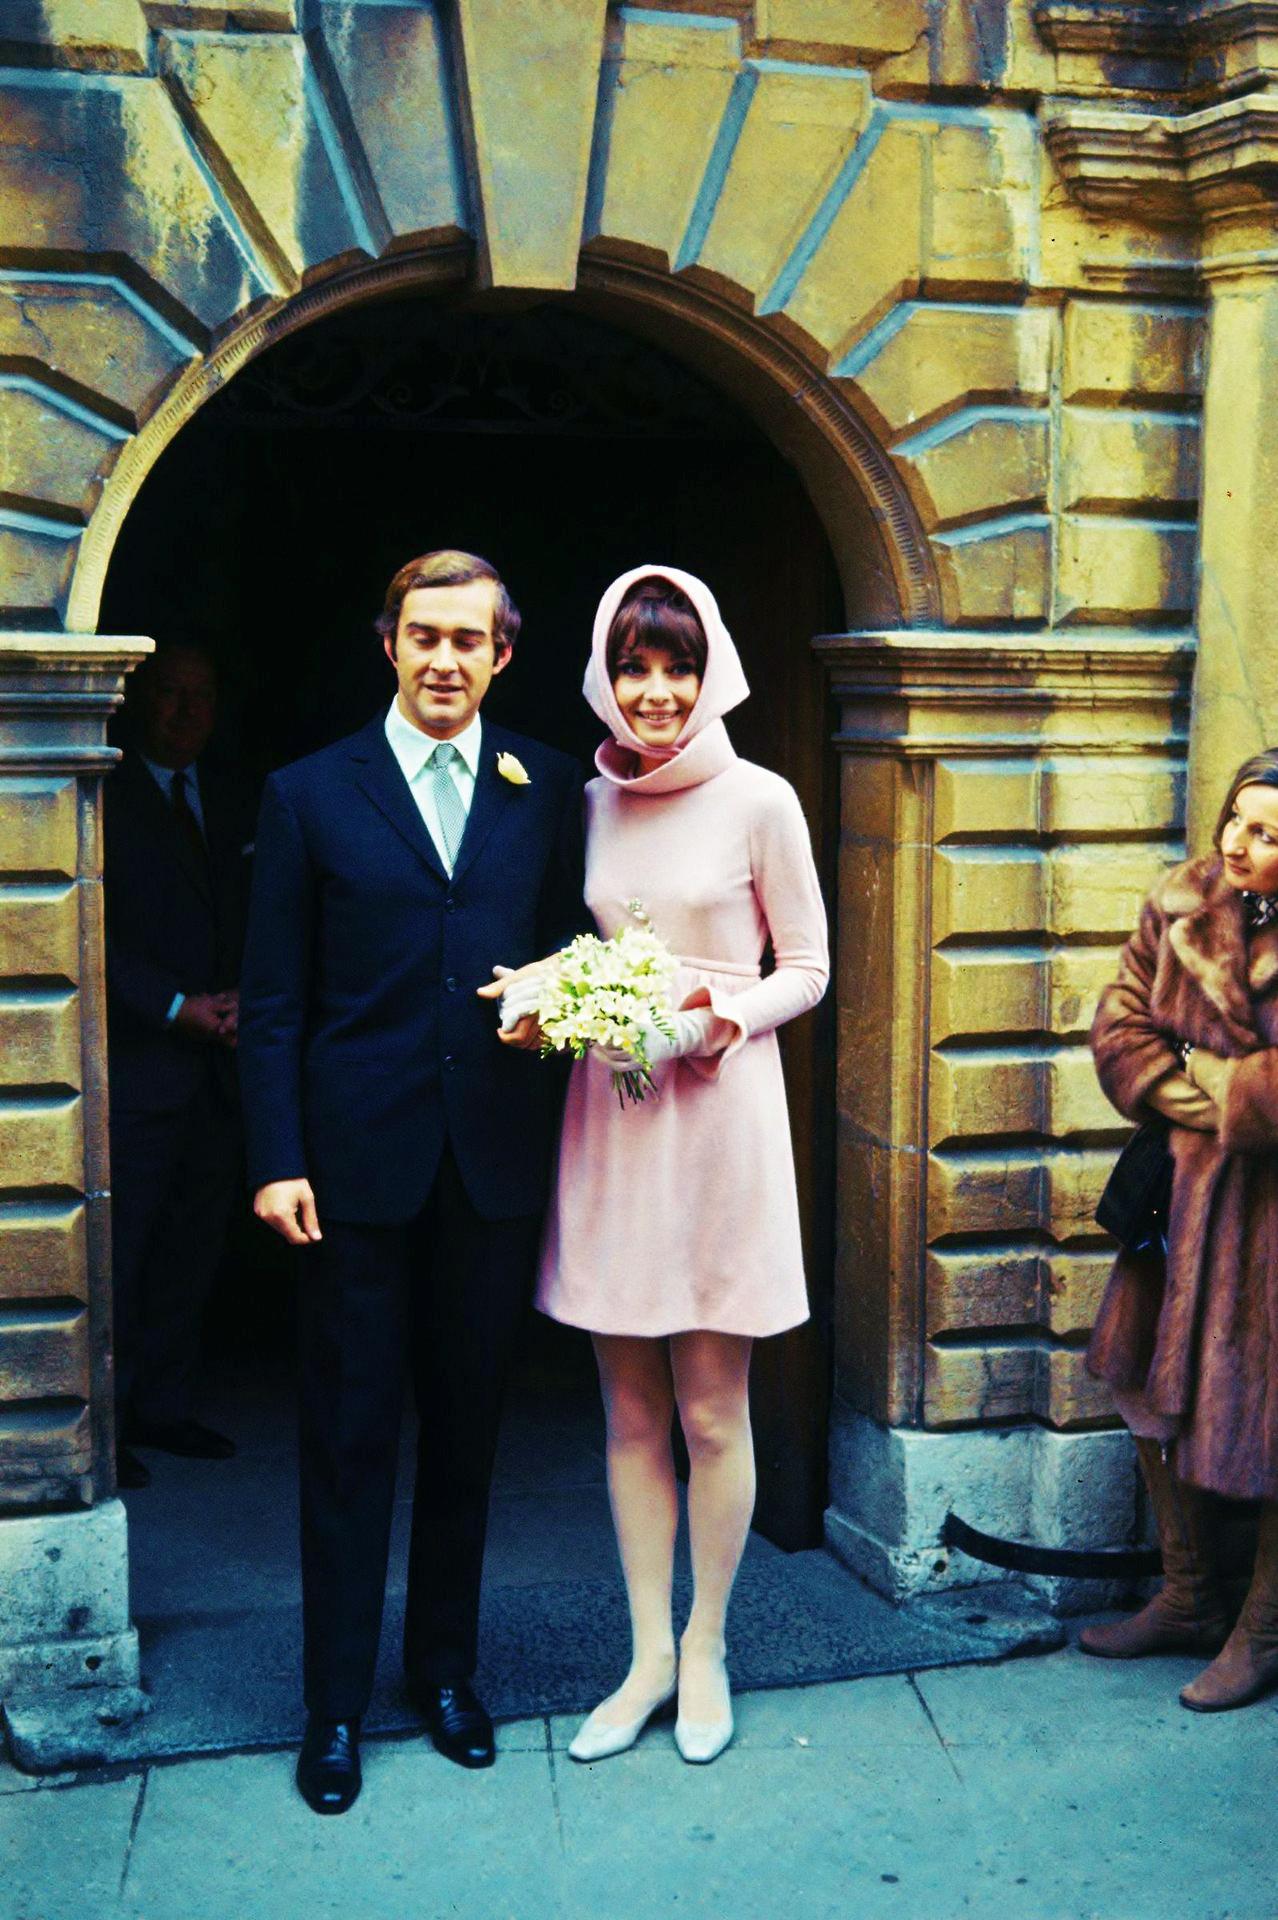 On January 18, 1969, at age 39, Audrey Hepburn marries Italian psychiatrist Andrea Dotti